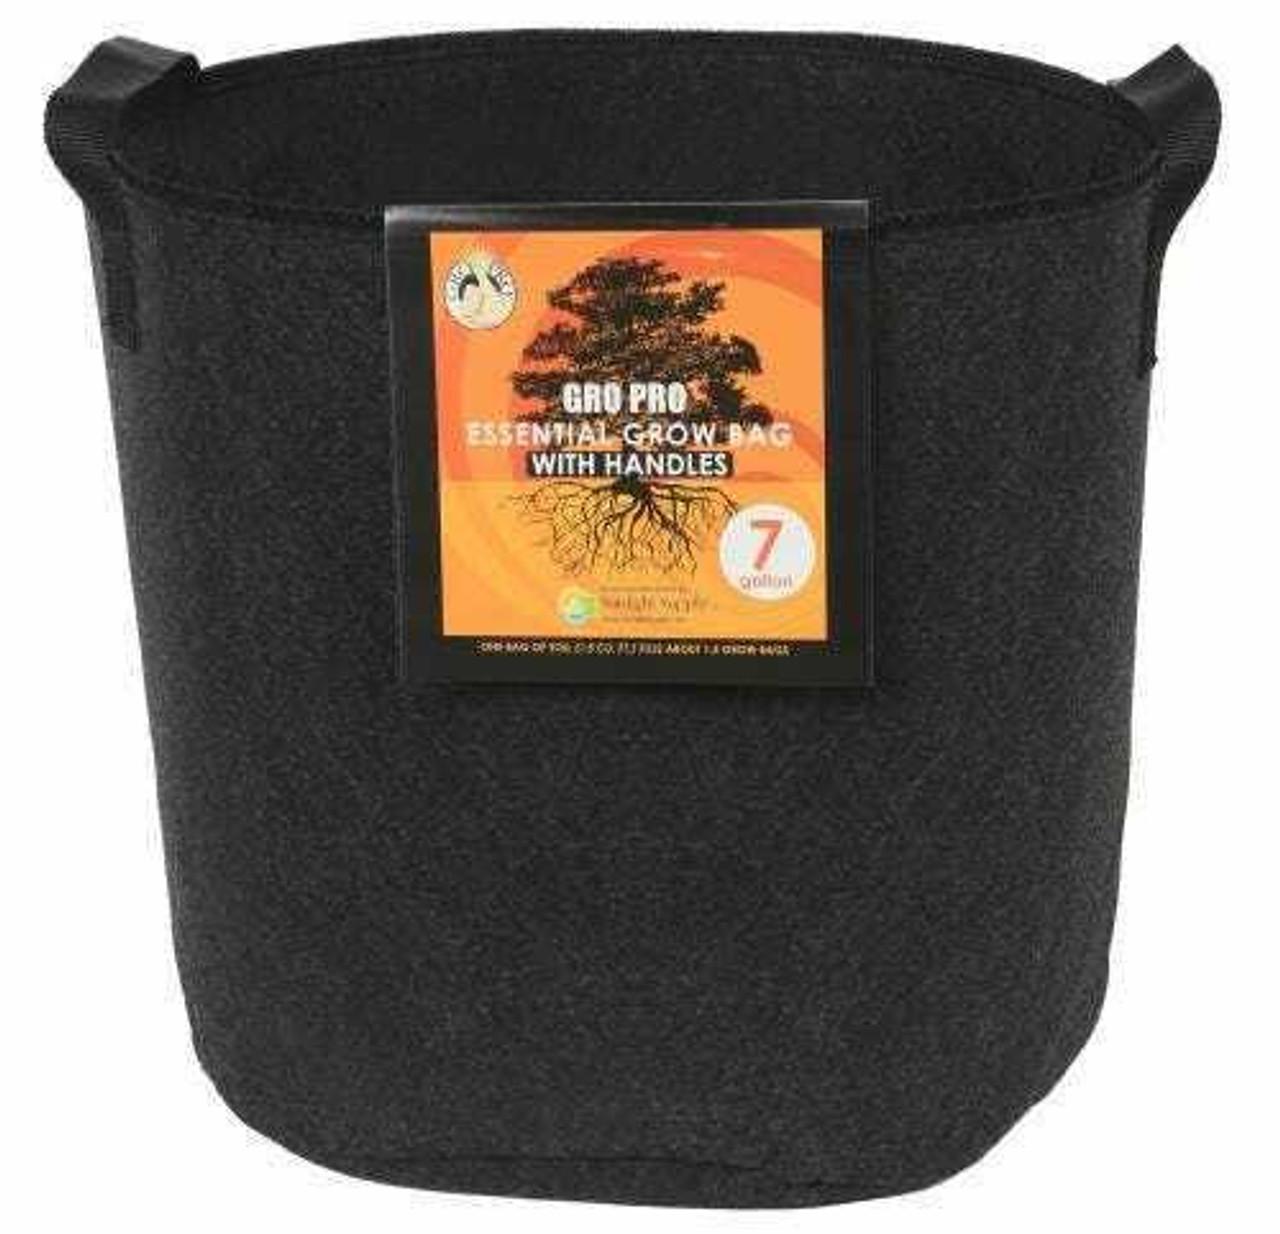 Gro Pro Essential Round Fabric Pot w/ Handles 7 Gallon - Black - 1